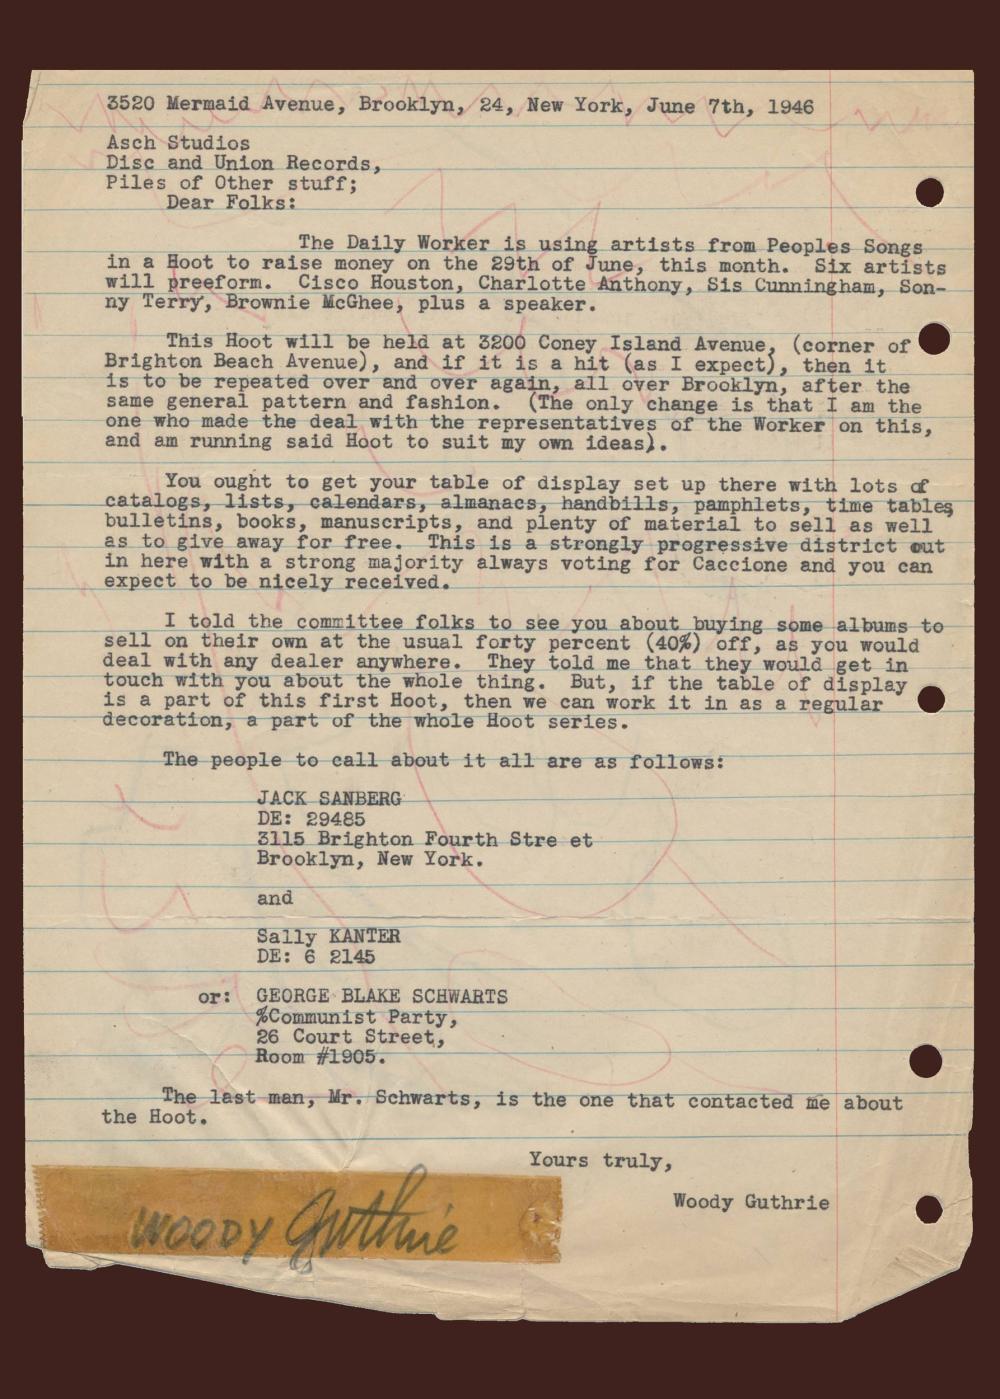 Woody Guthrie TLS to Asch Studios Regarding the Hoot Folk Festival